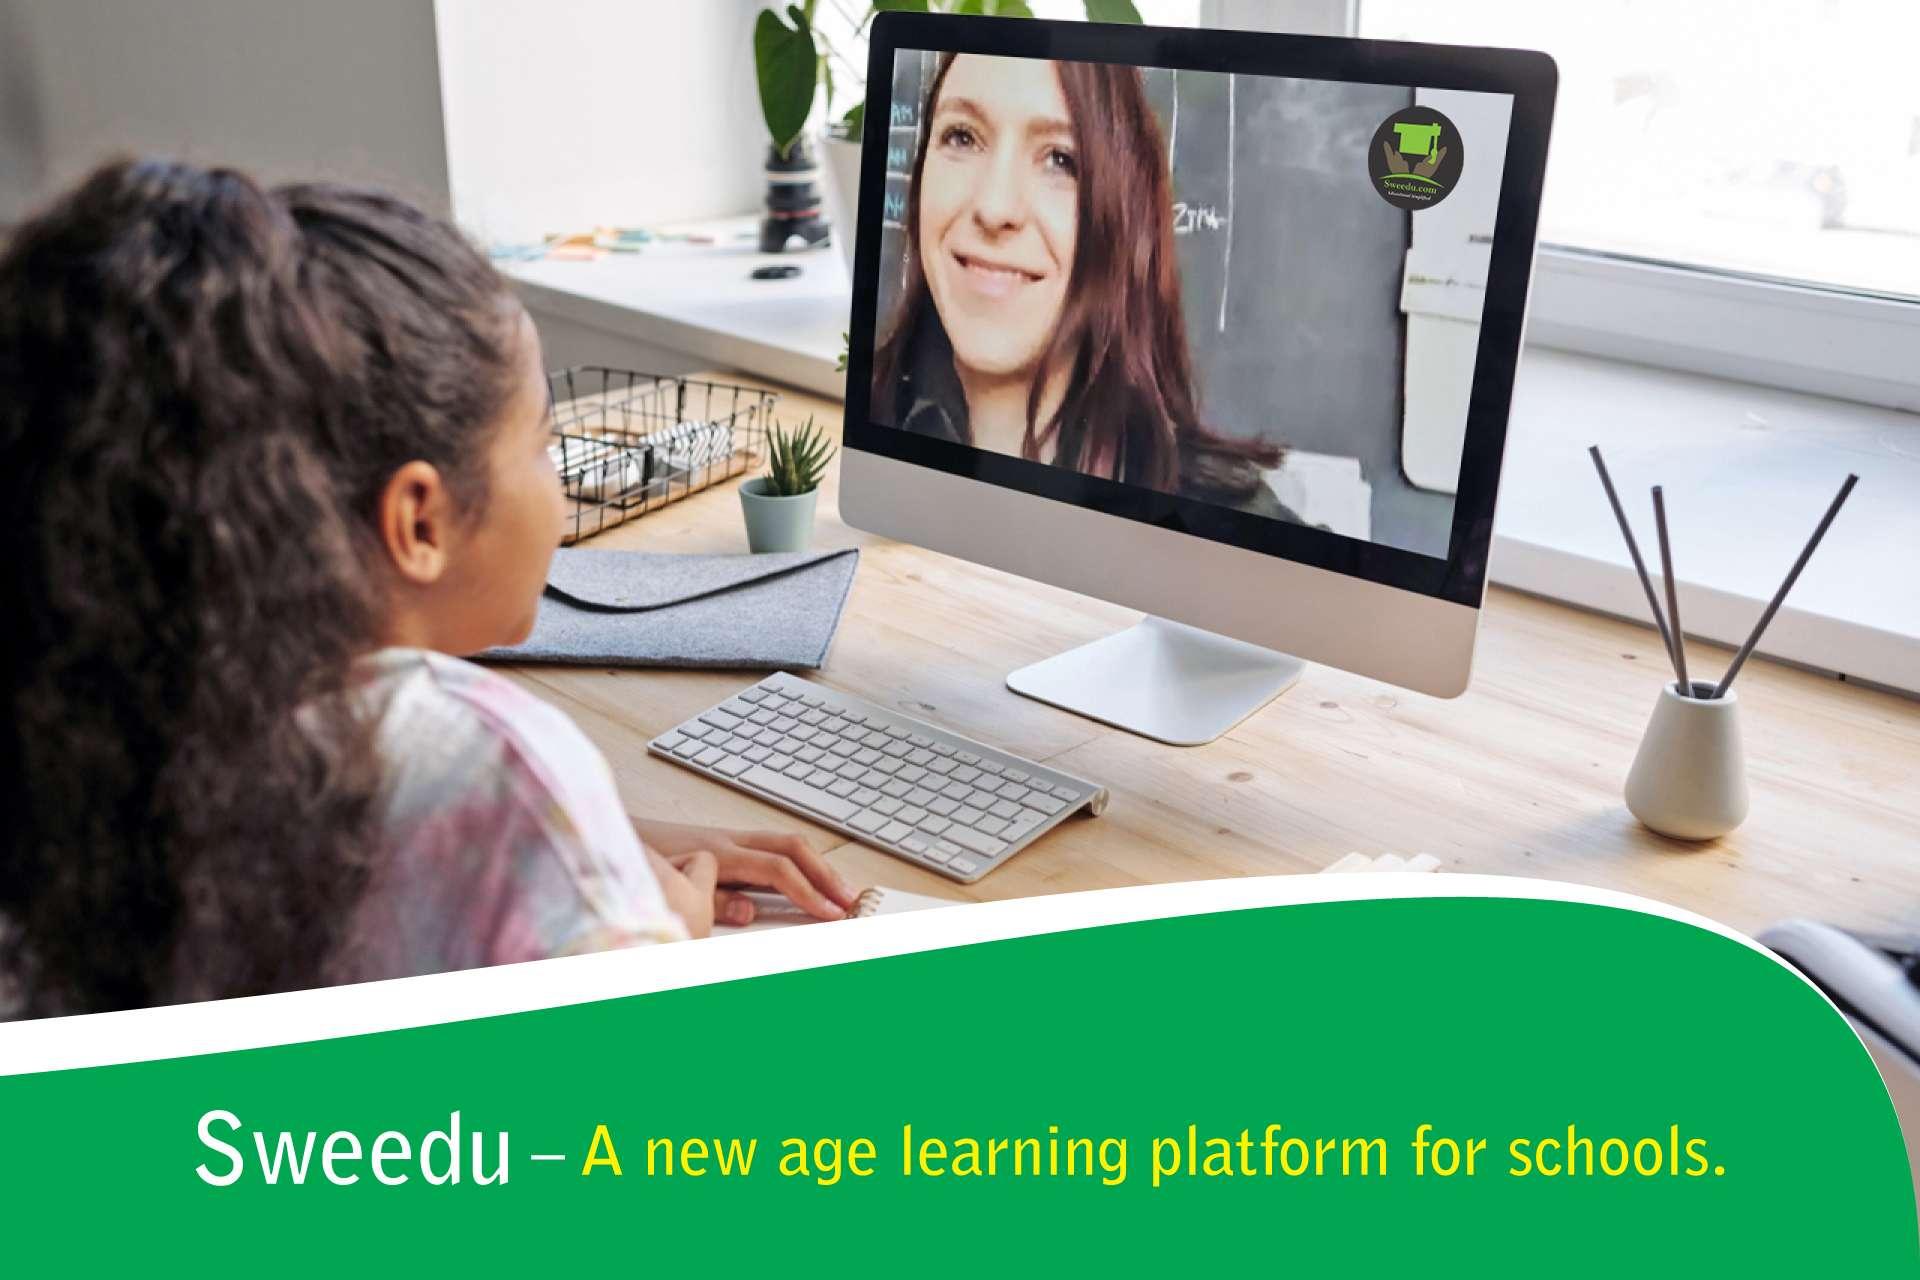 online class for childern